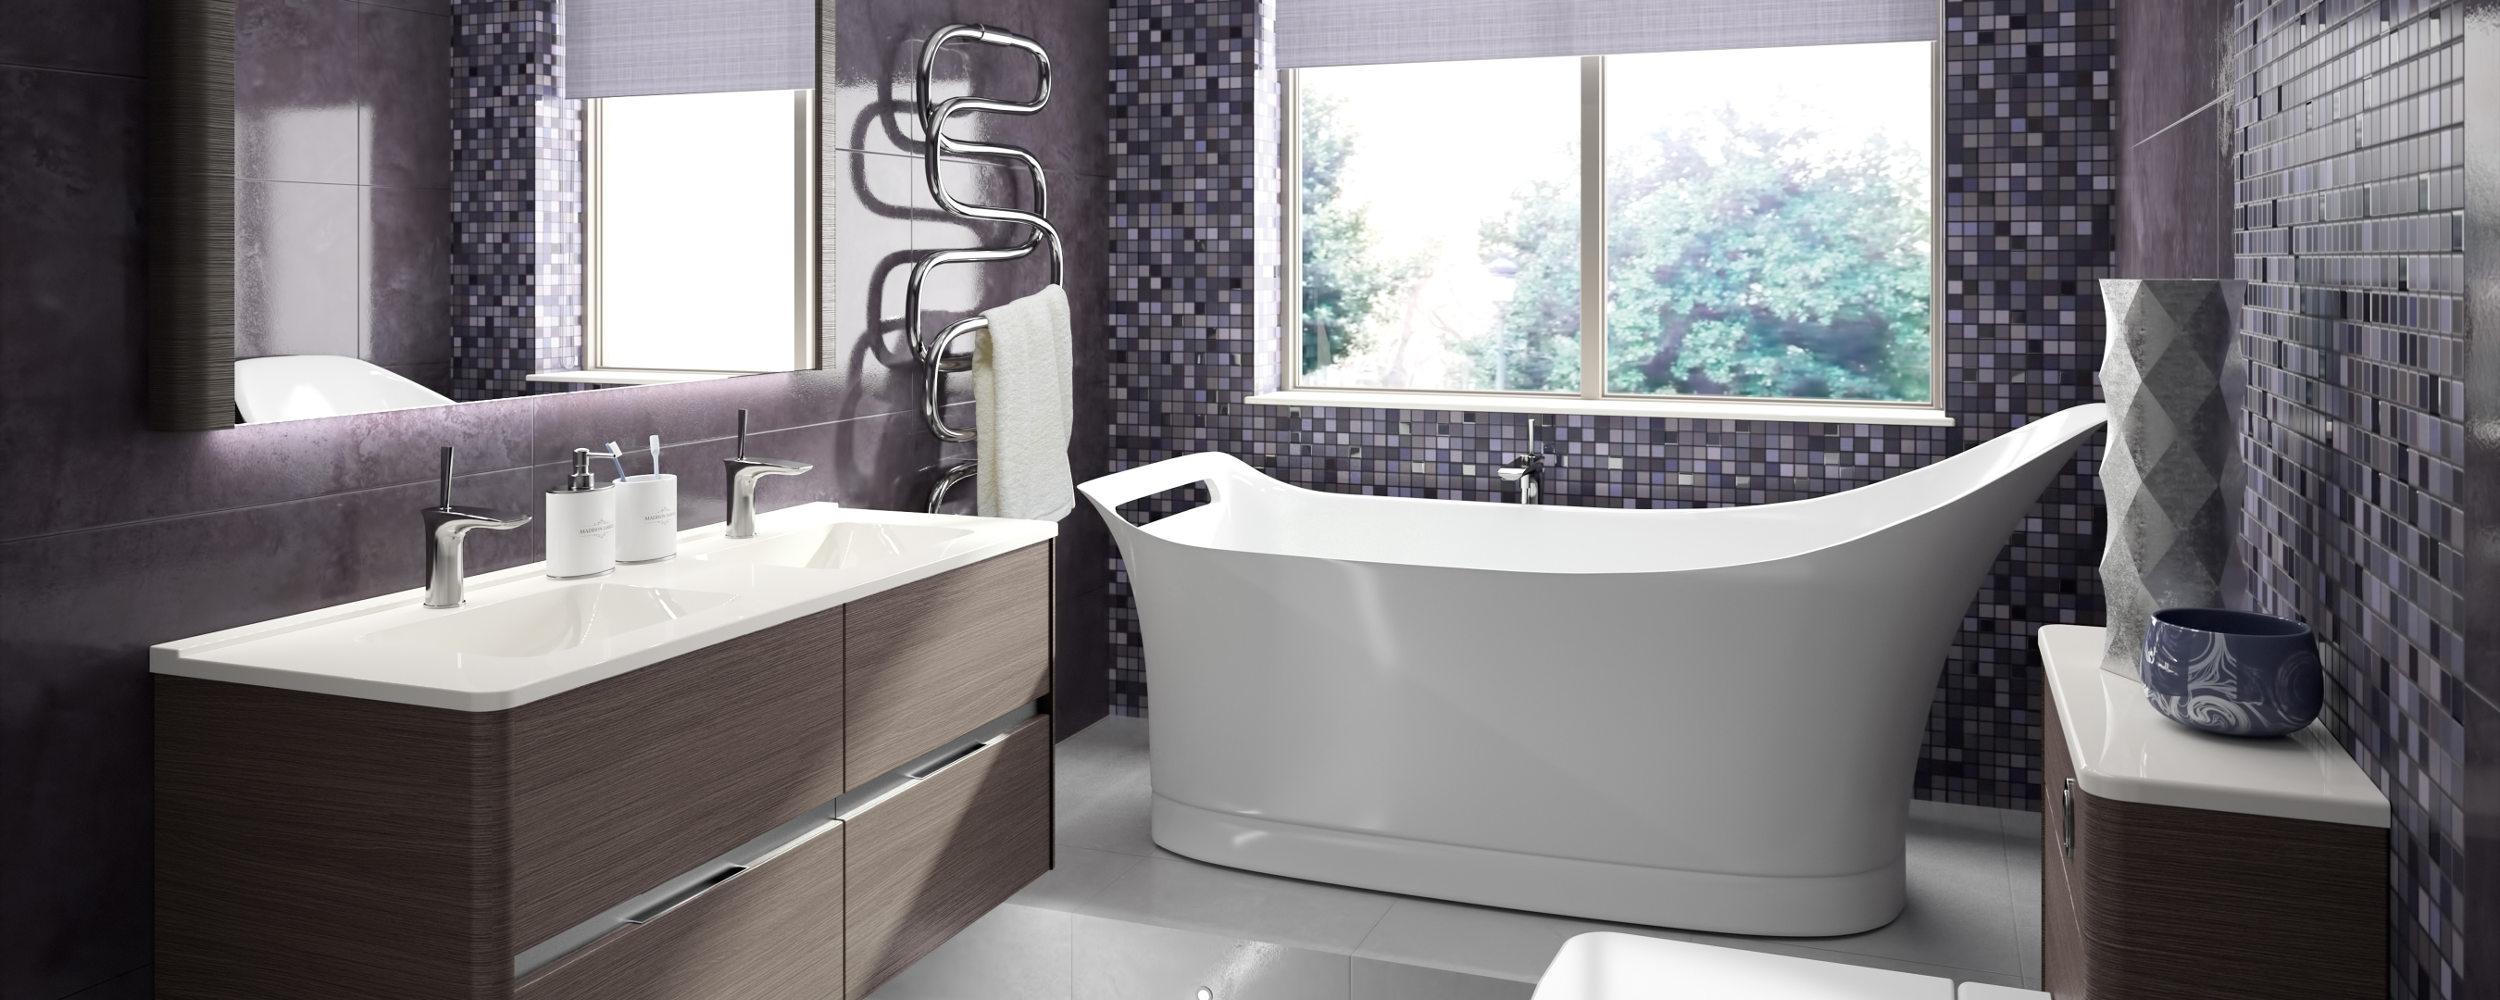 modern bathroom design Dunfermline